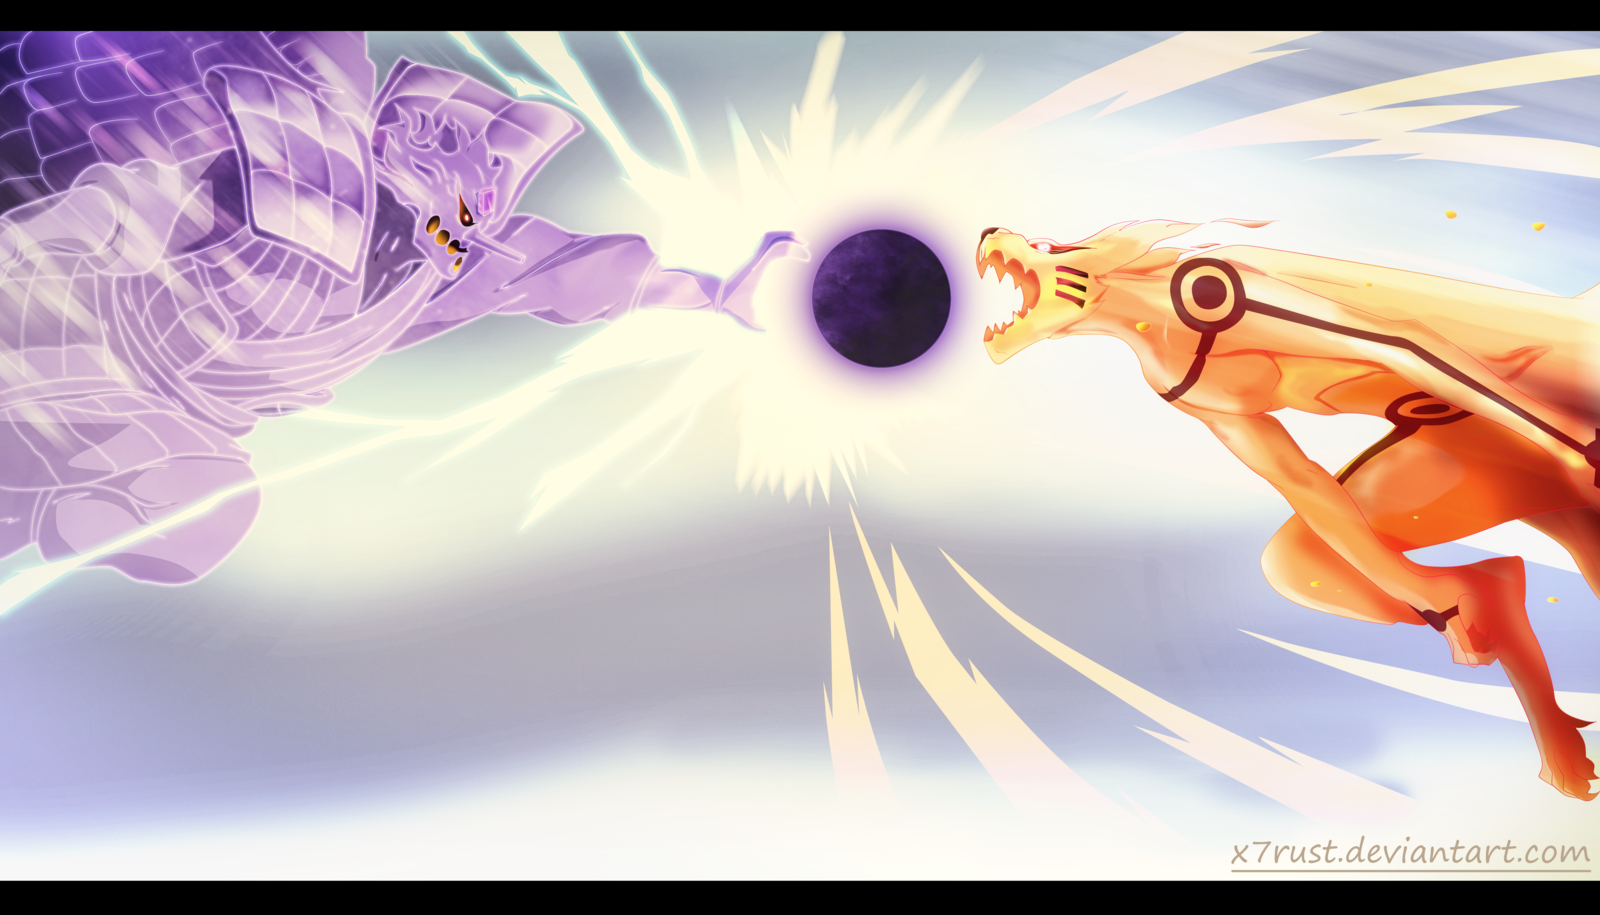 Naruto Vs Sasuke Understand Each Other Naruto 695 Daily Anime Art